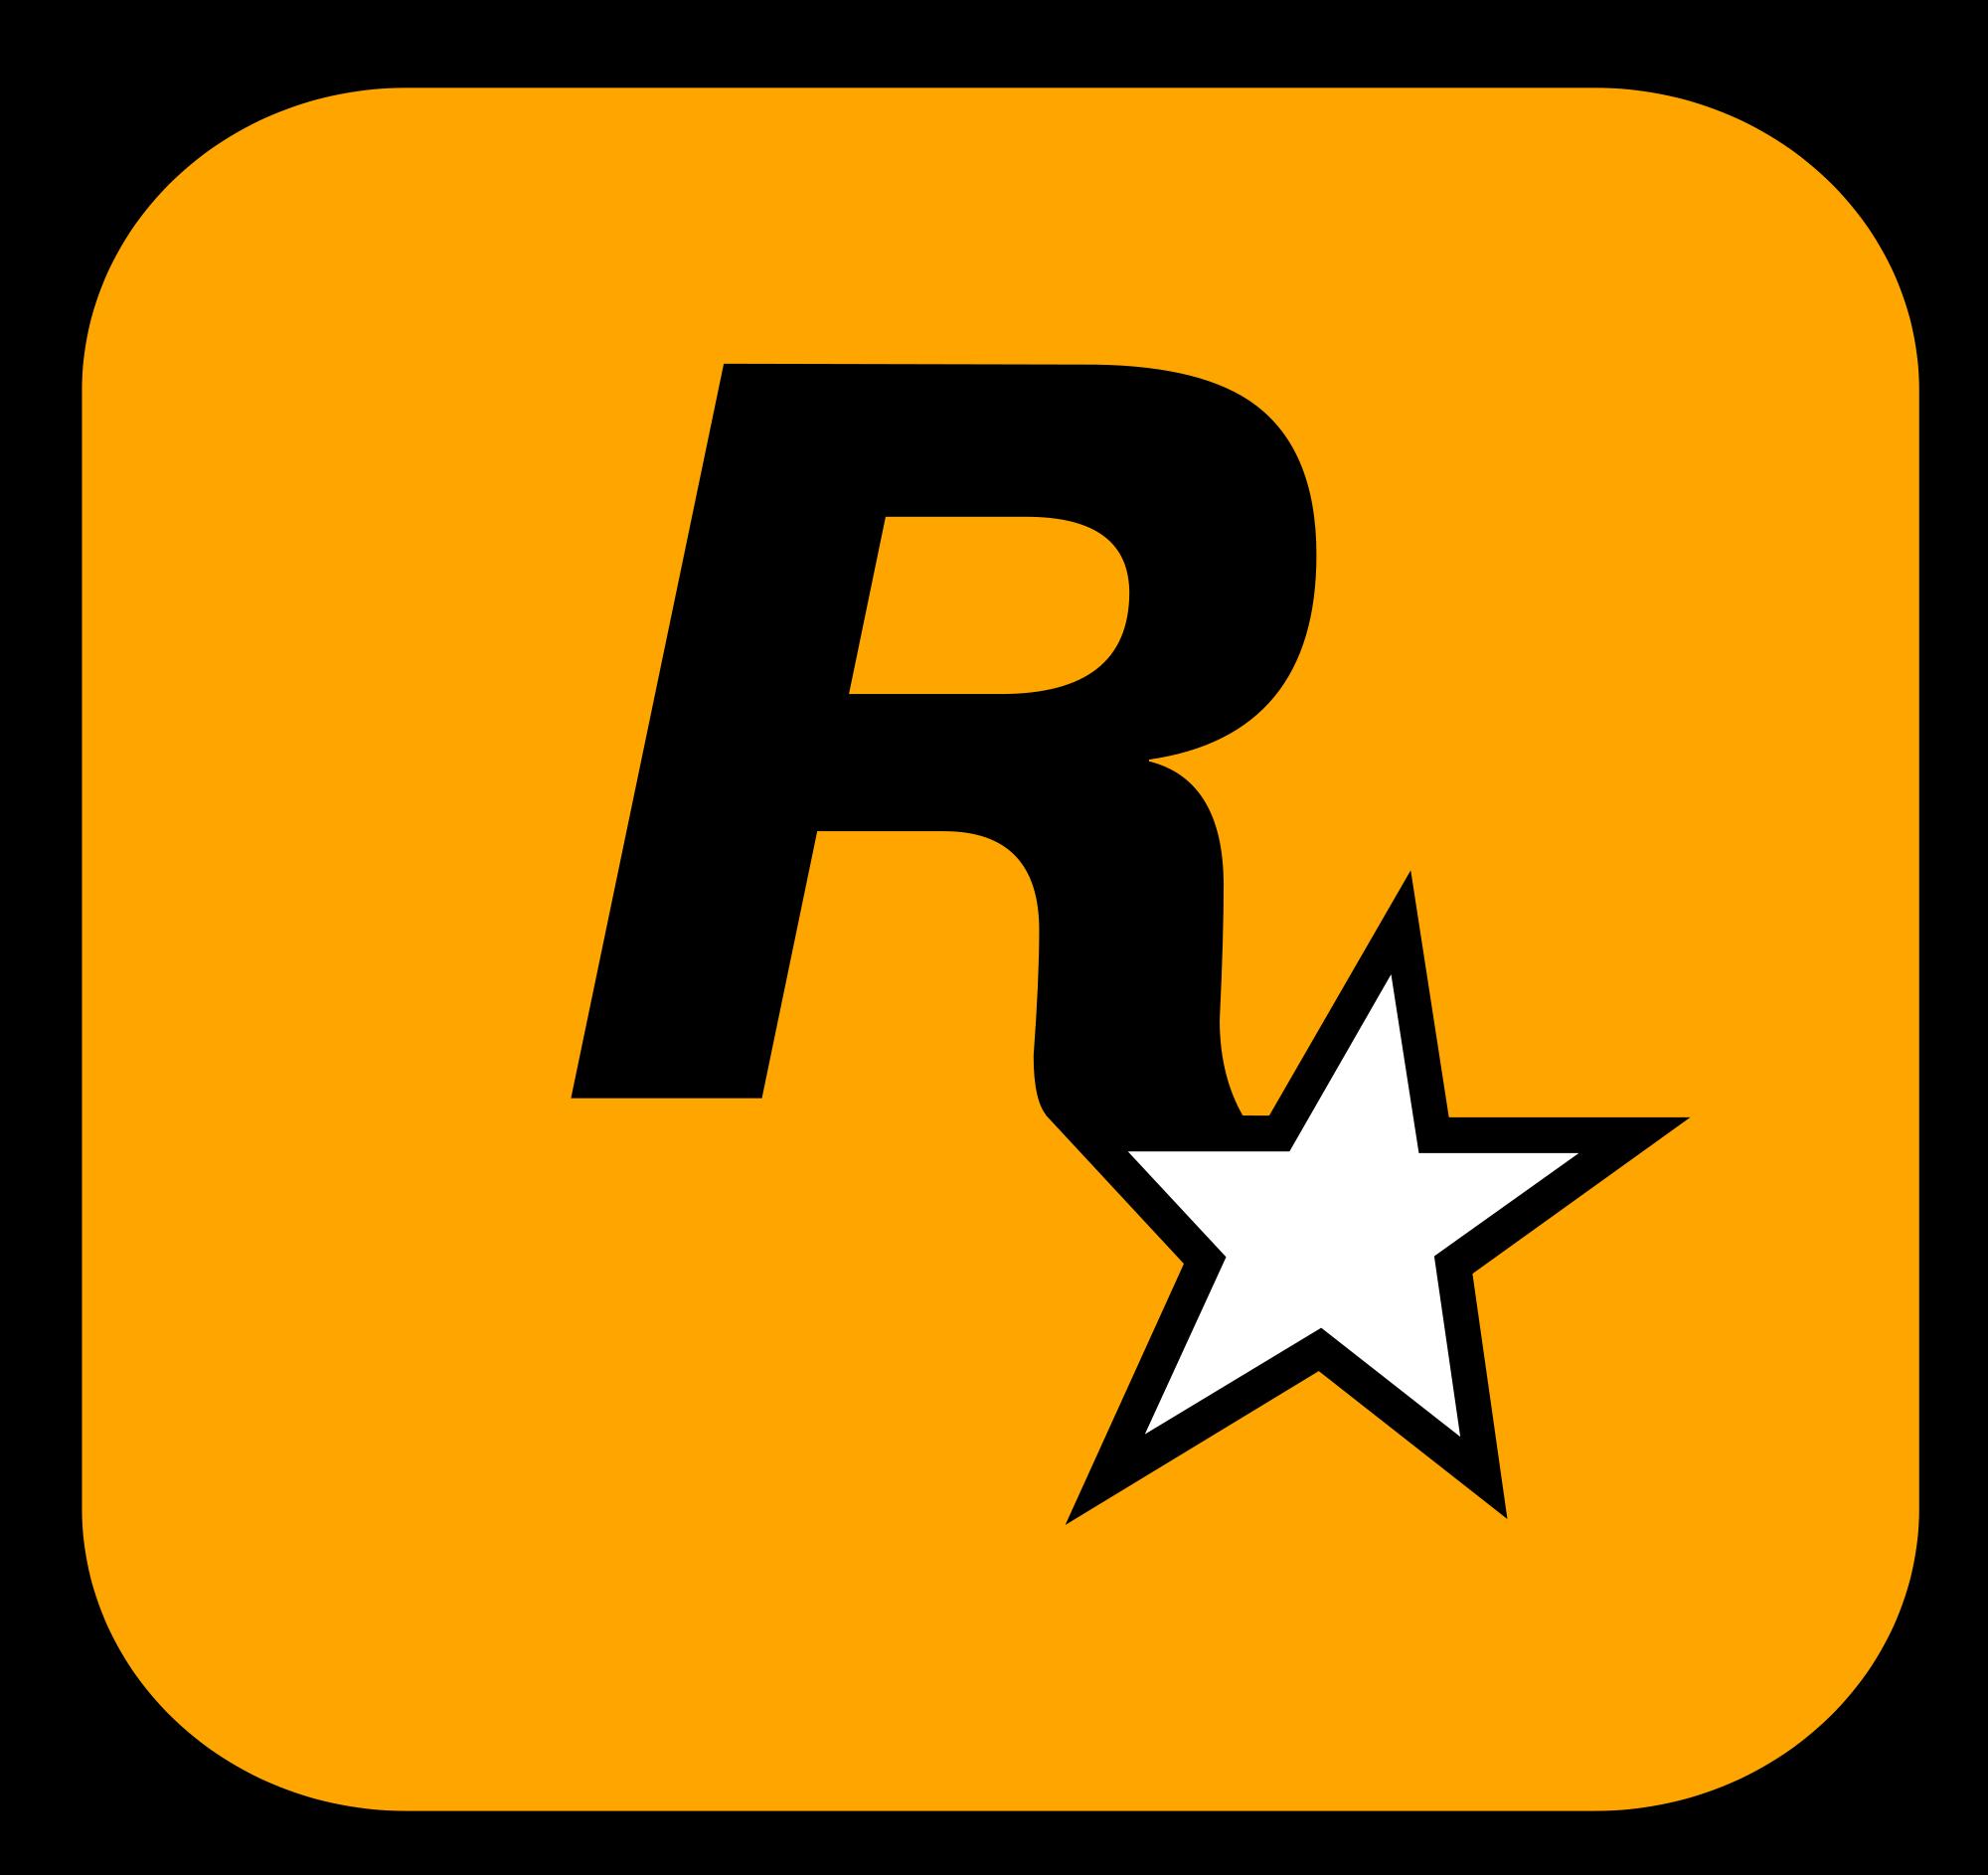 Rockstar Games Wikipedia The Free Encyclopedia Rockstar Games Logo Rockstar Games Game Logo